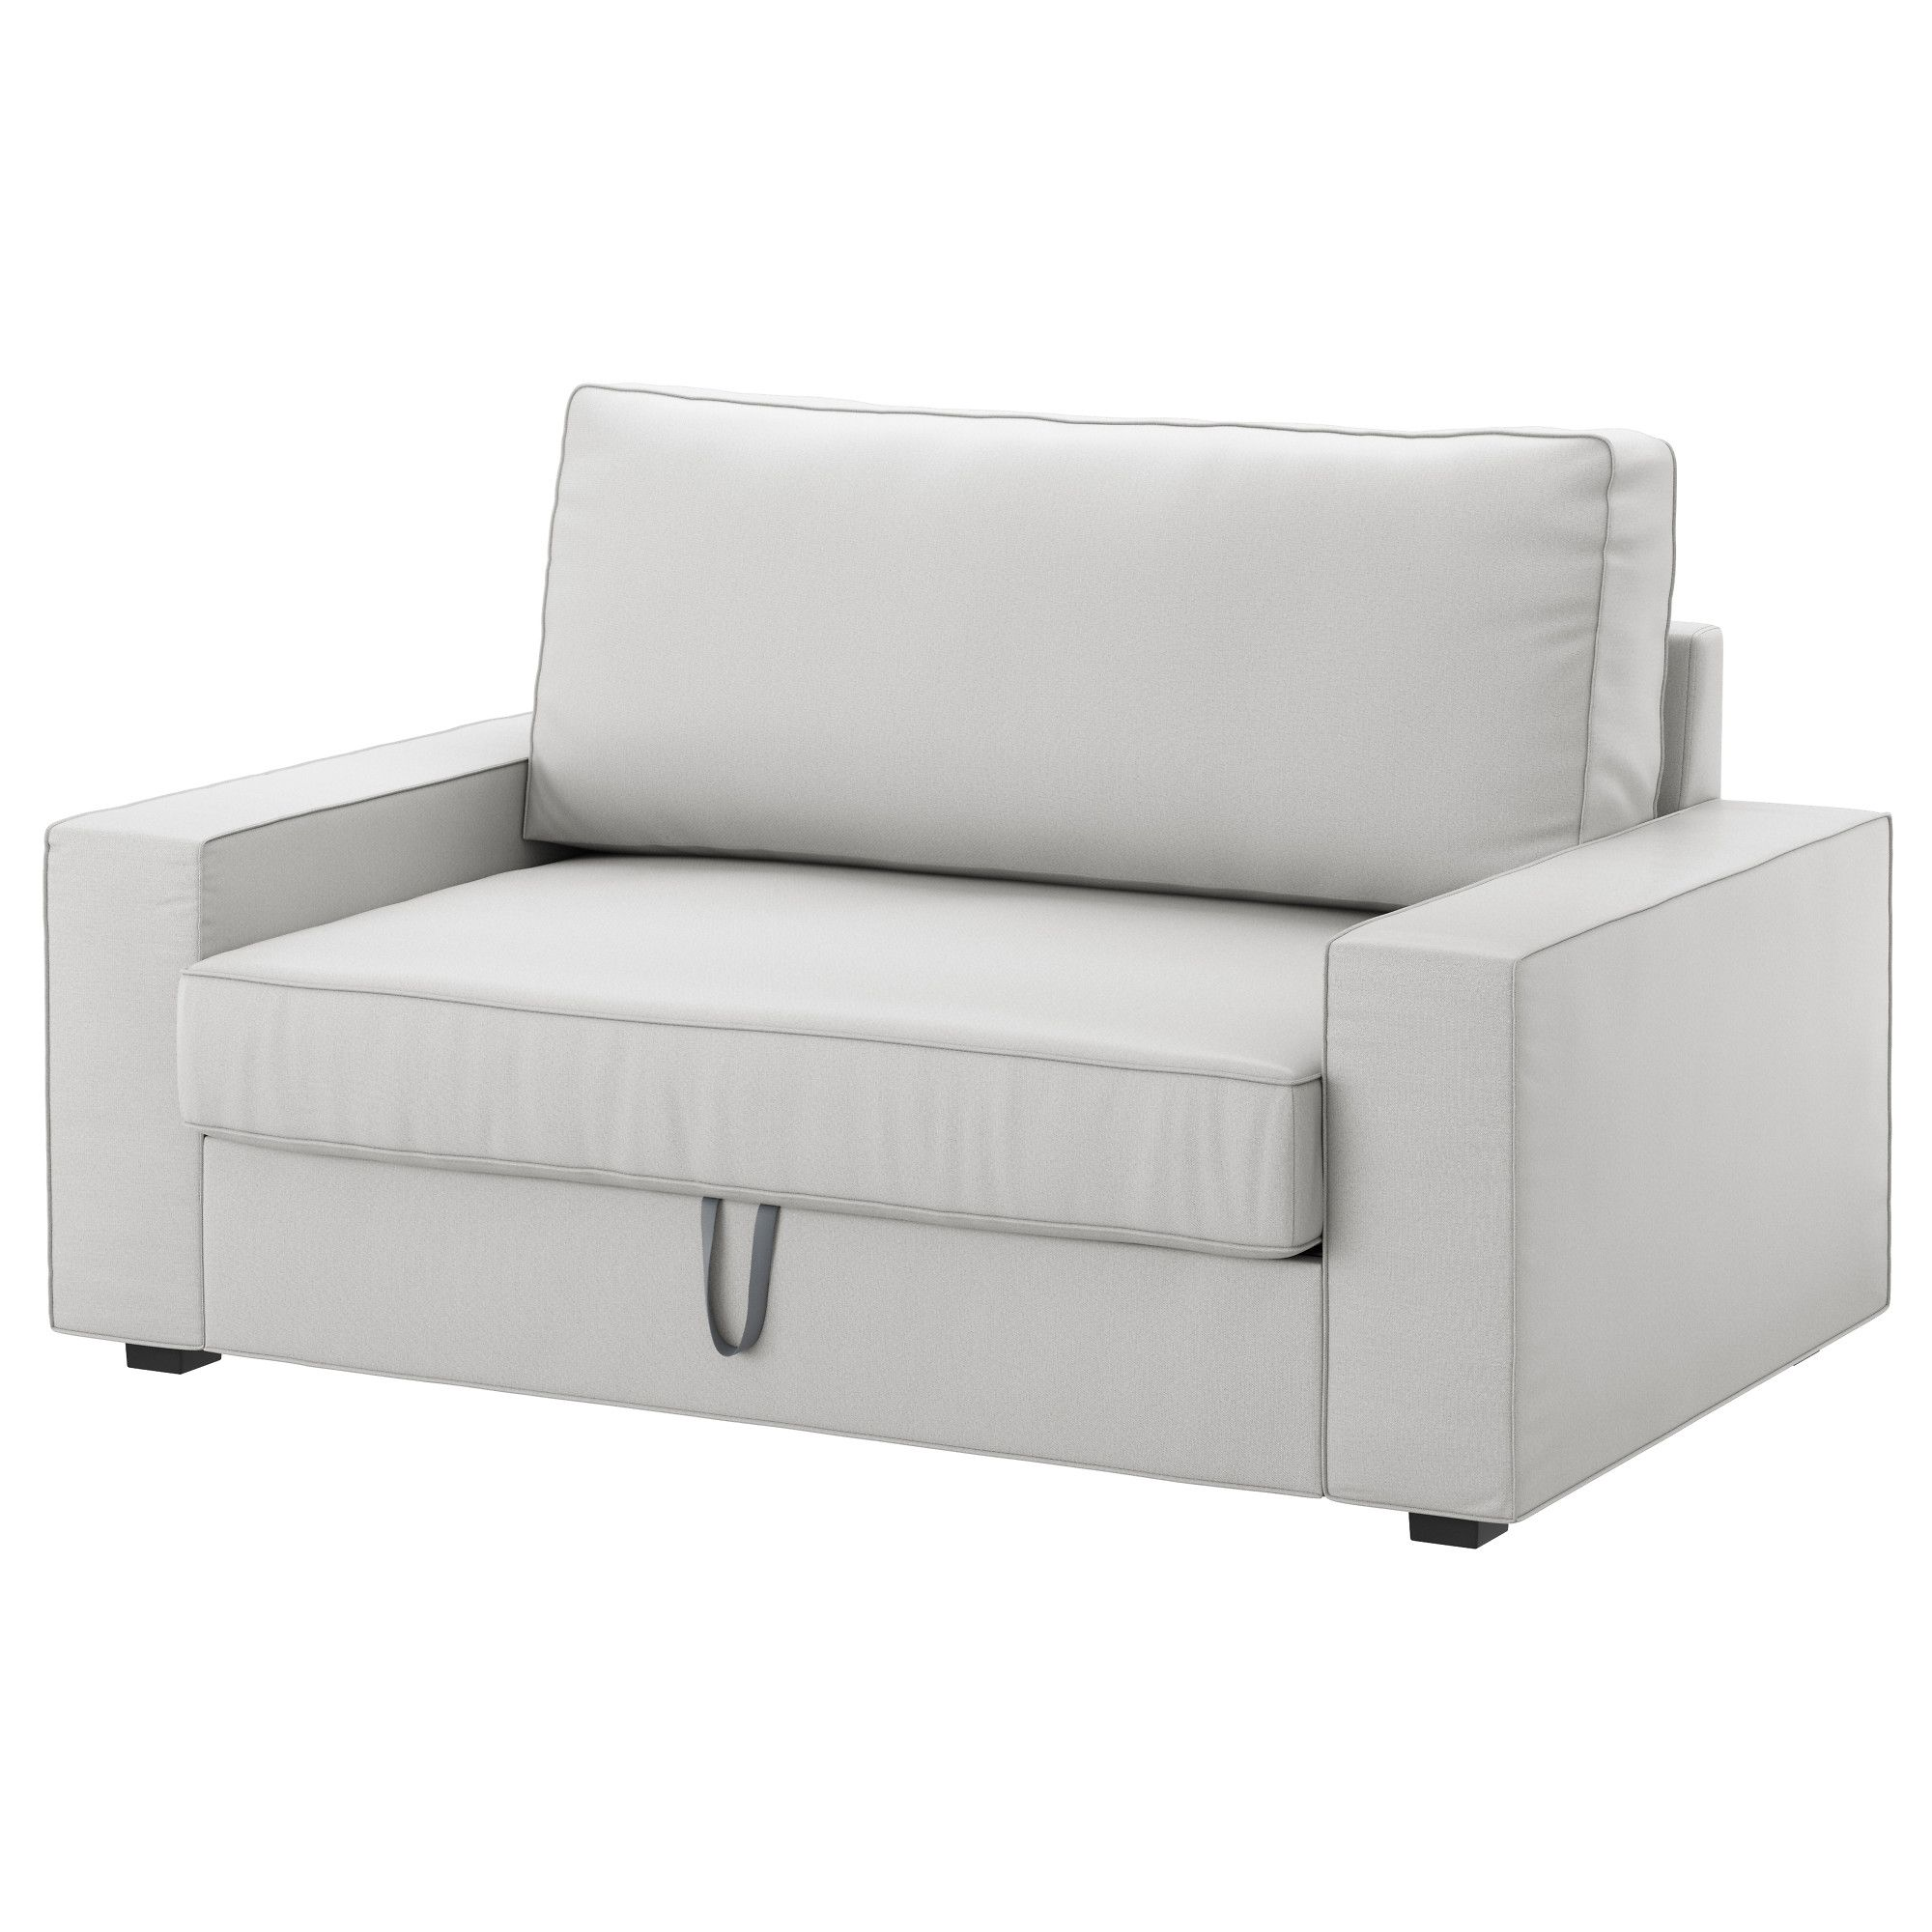 Canapé Ikea Convertible 2 Places vilasund sofa dwuosobowa rozkładana - orrsta jasnoszary